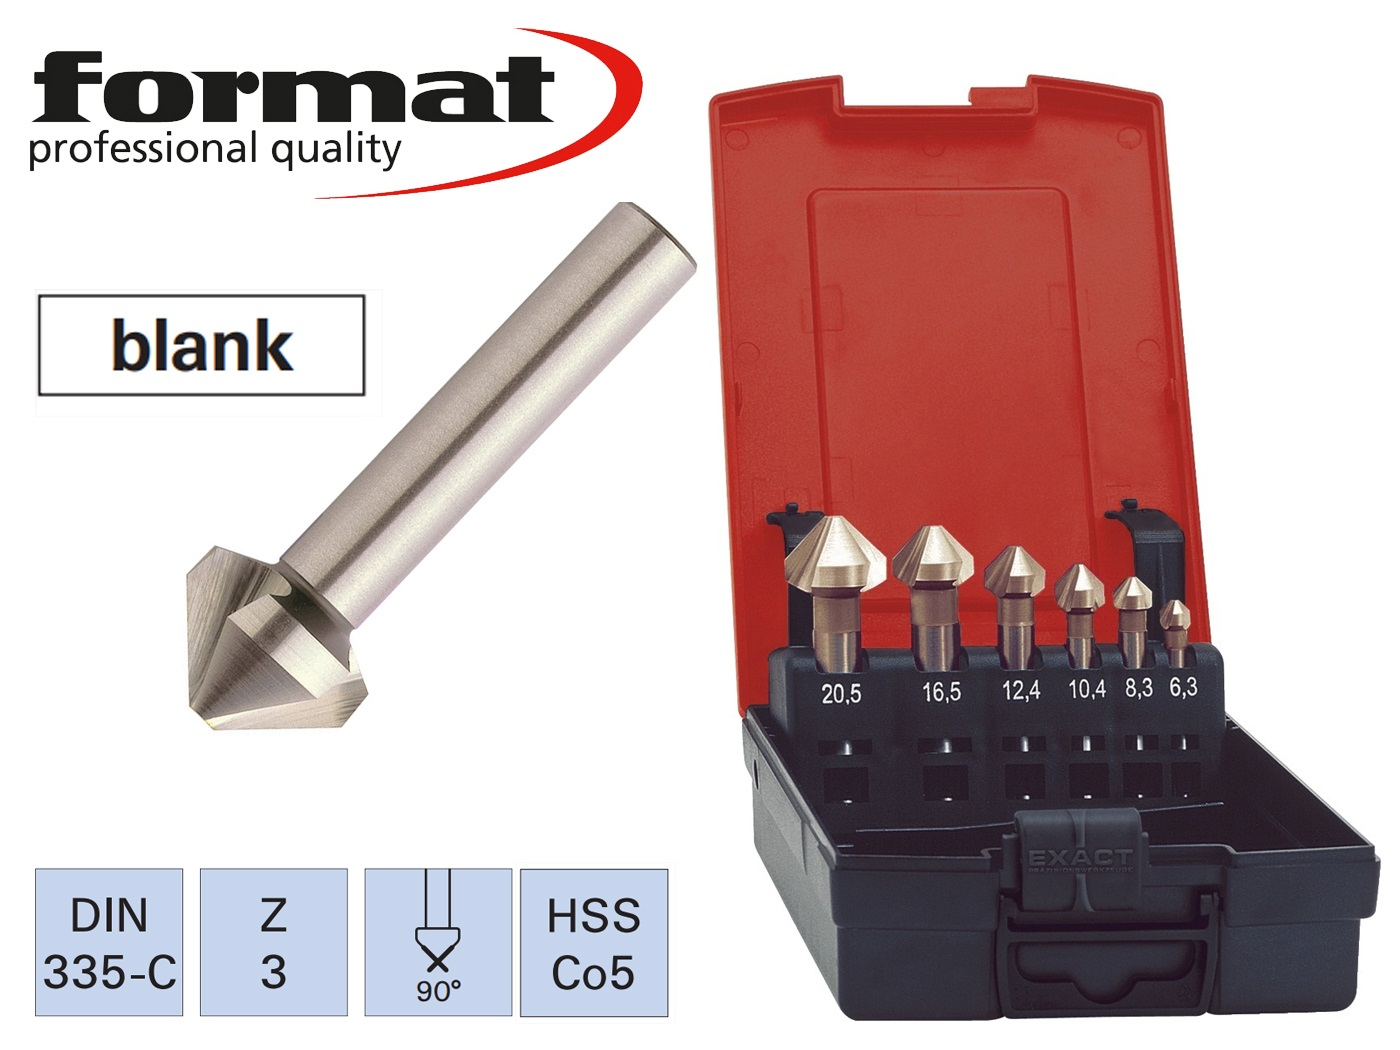 verzinkborenset DIN 335 C HSS TiN 90 G FORMAT | DKMTools - DKM Tools